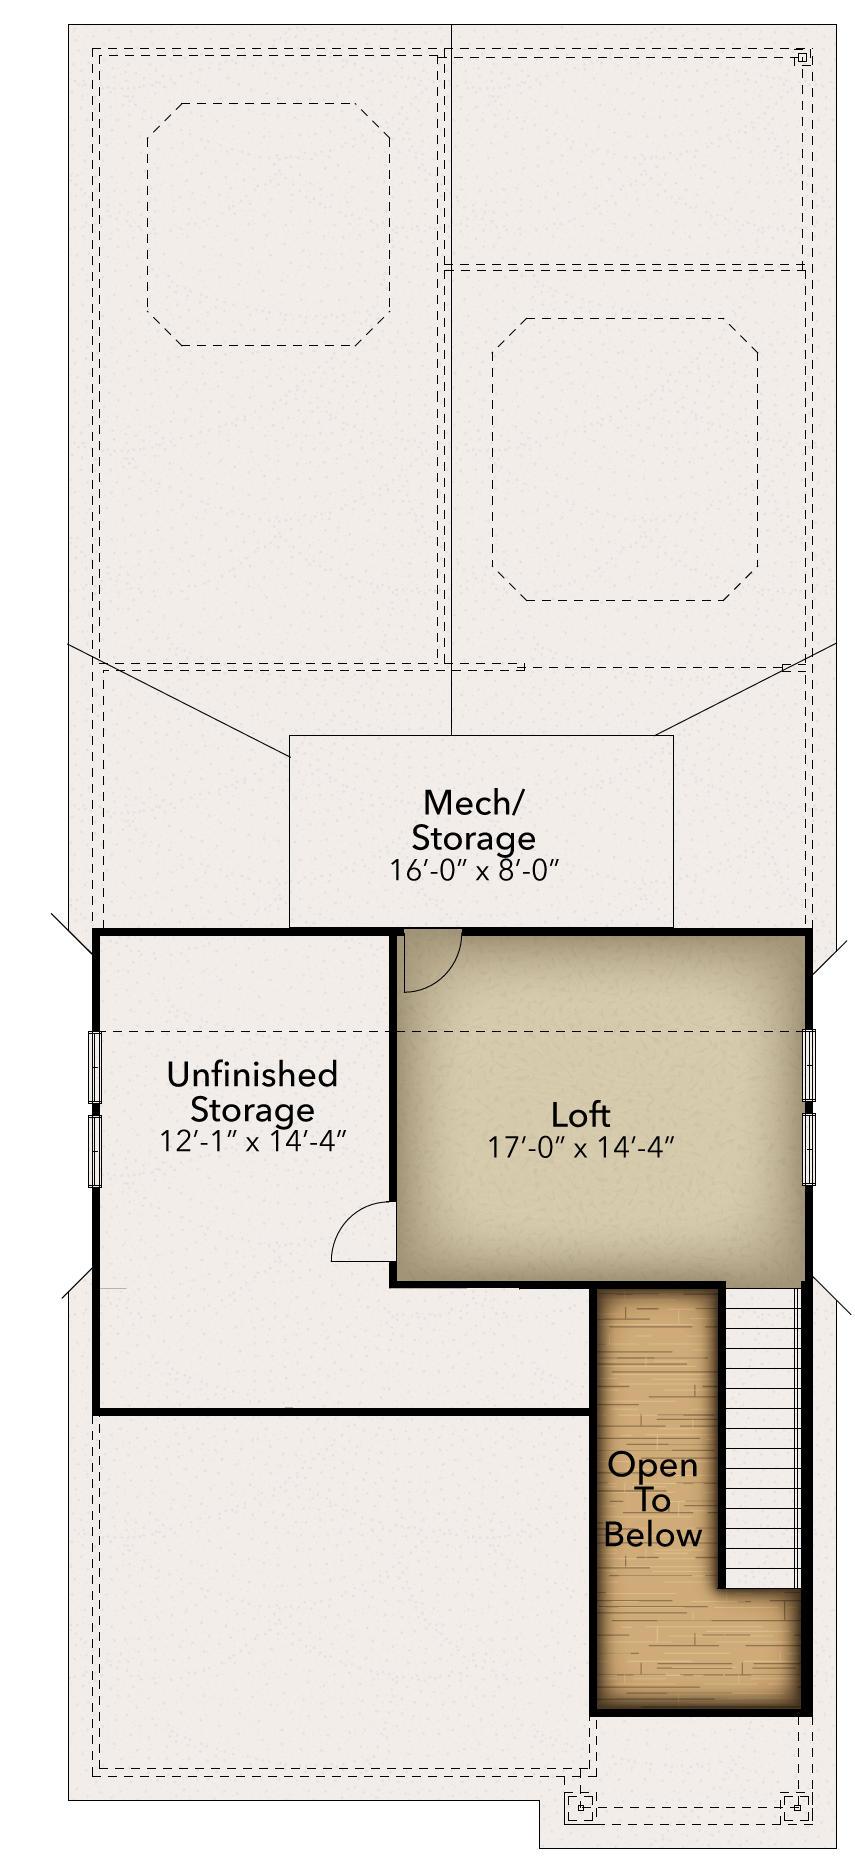 Chesapeake Homes -  284 Goldenrod Circle, Little River, SC 29566 Optional second floor